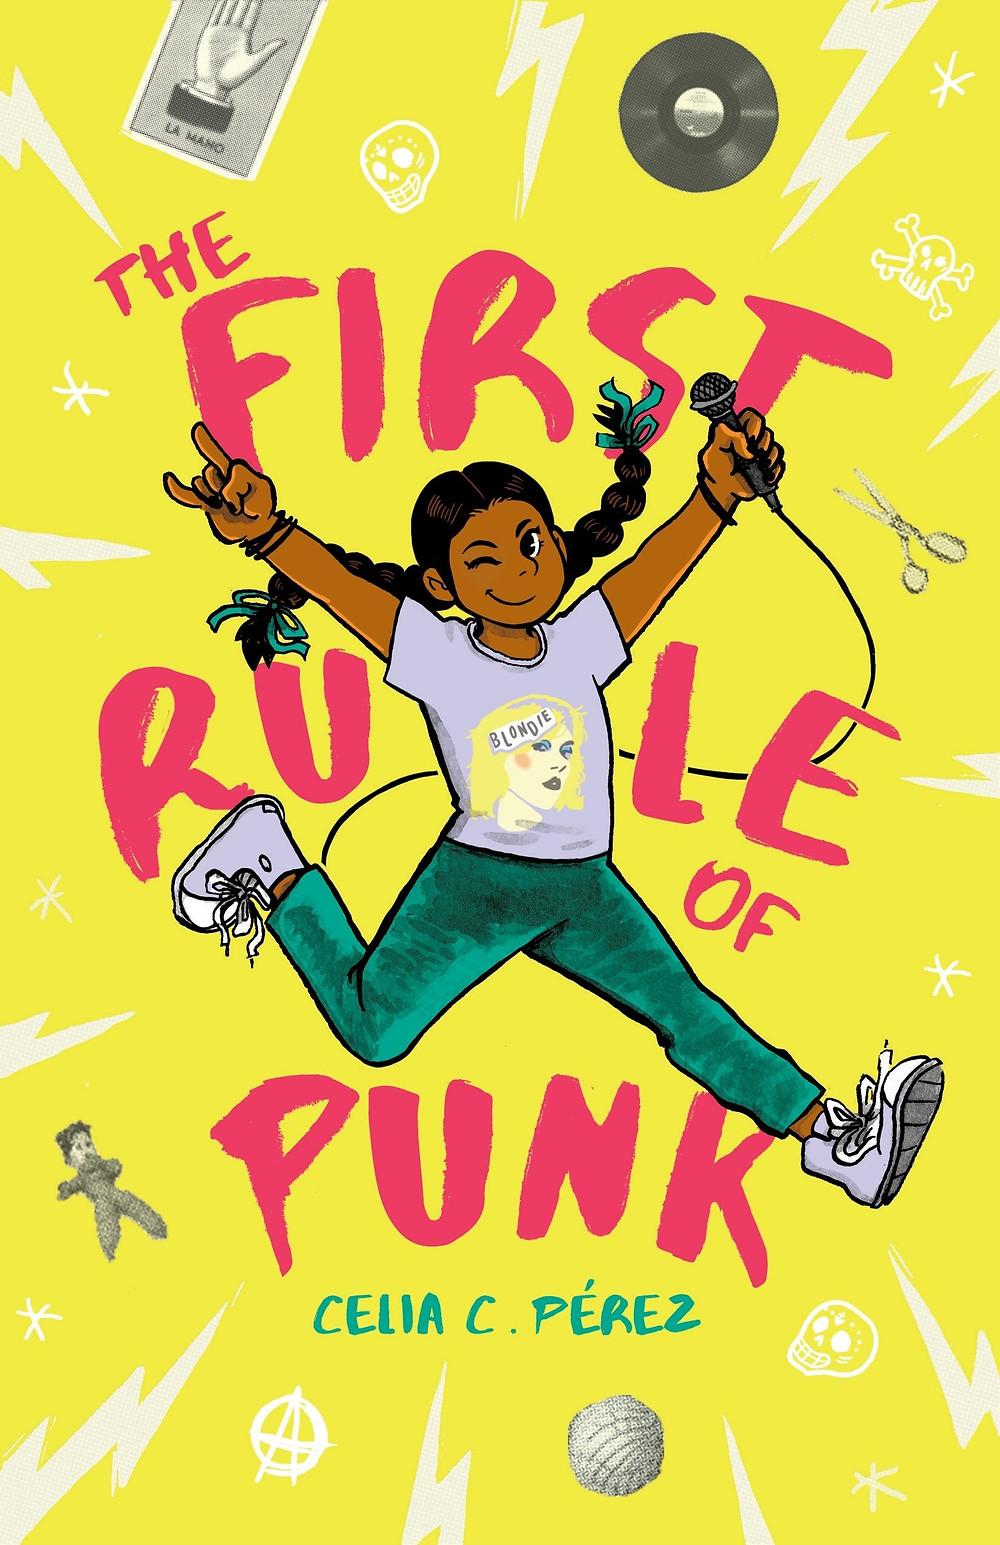 The First Rule of Punk by Celia C. Pérez